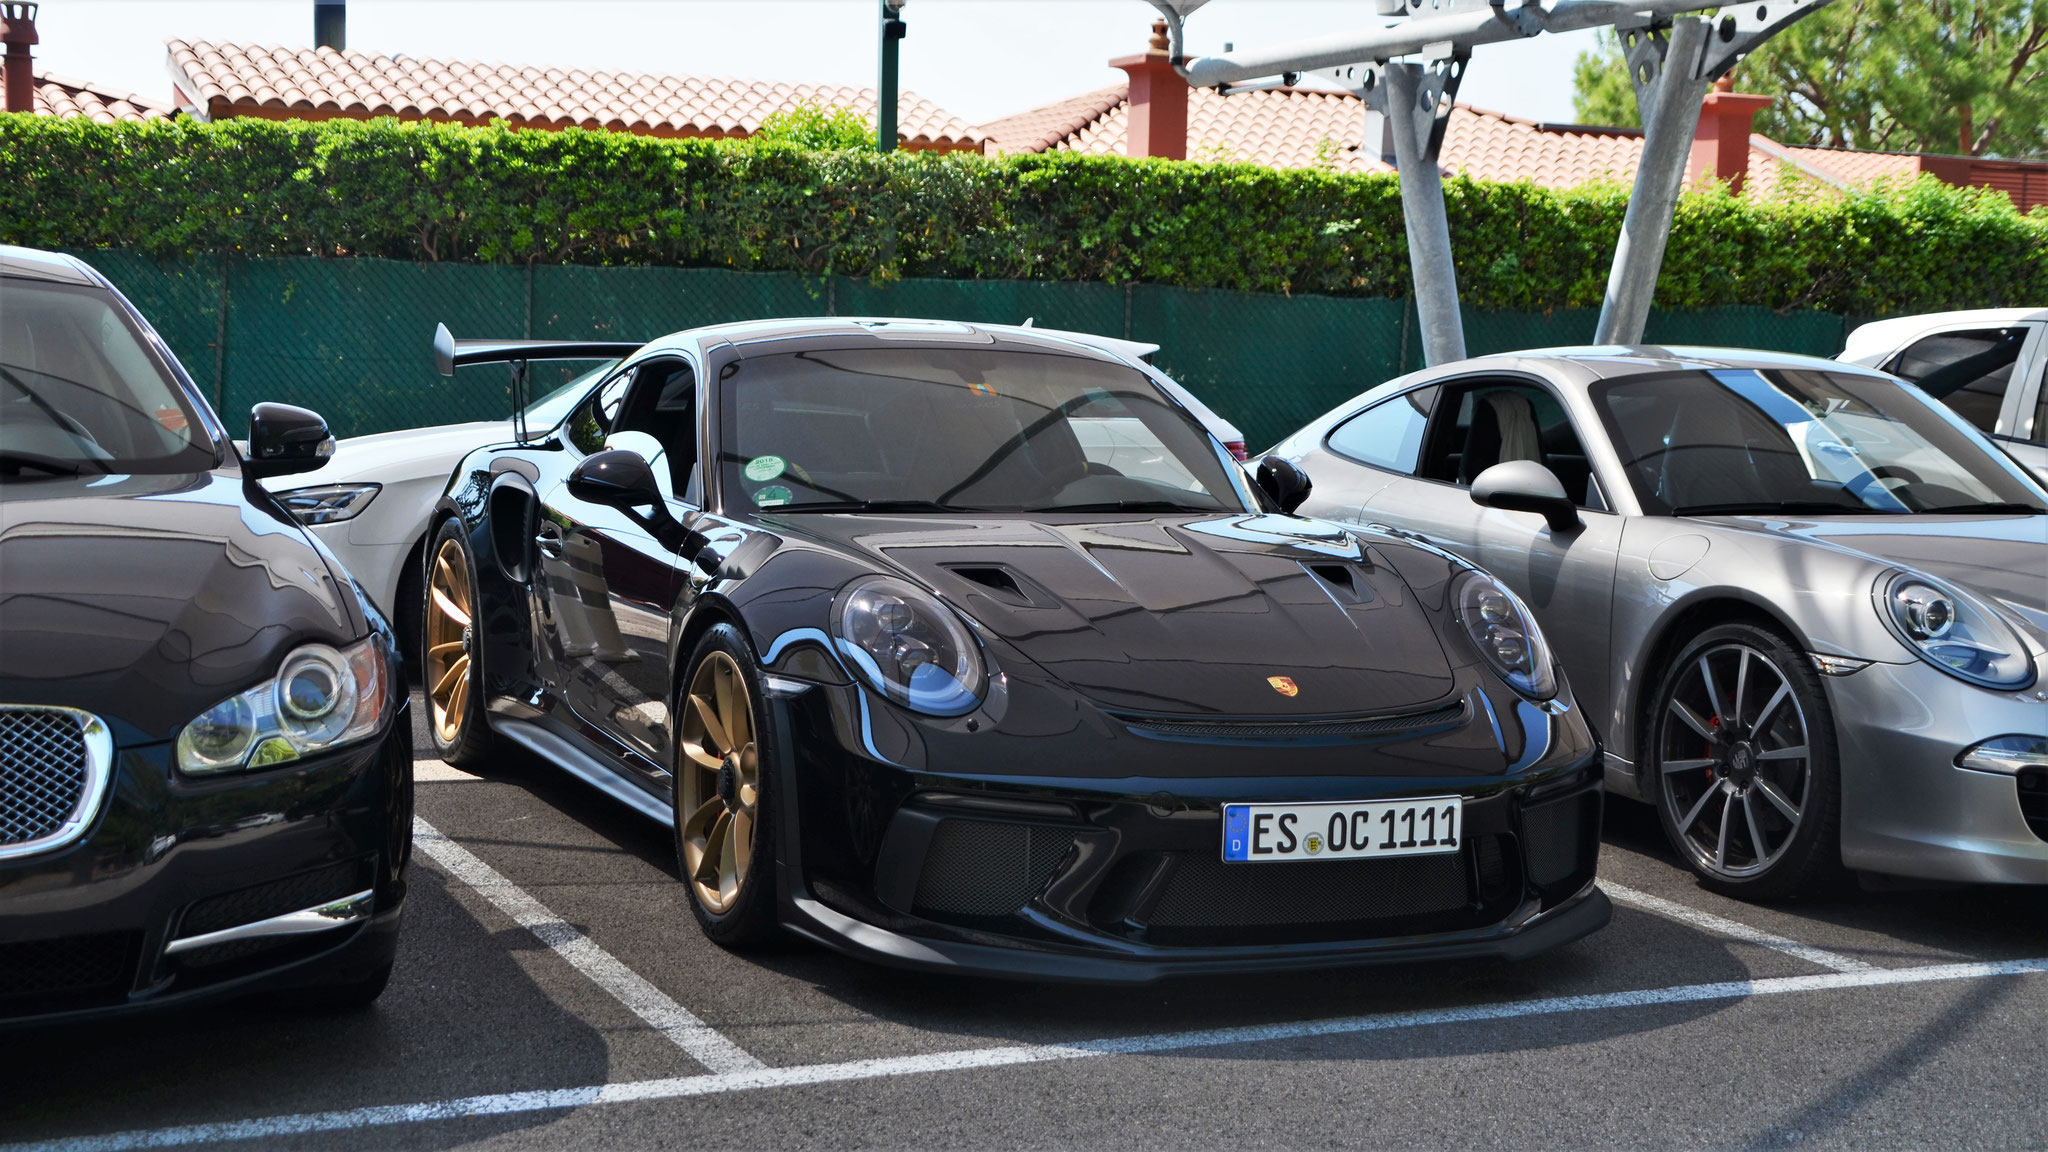 Porsche 911 991.2 GT3 RS - ES-OC-1111